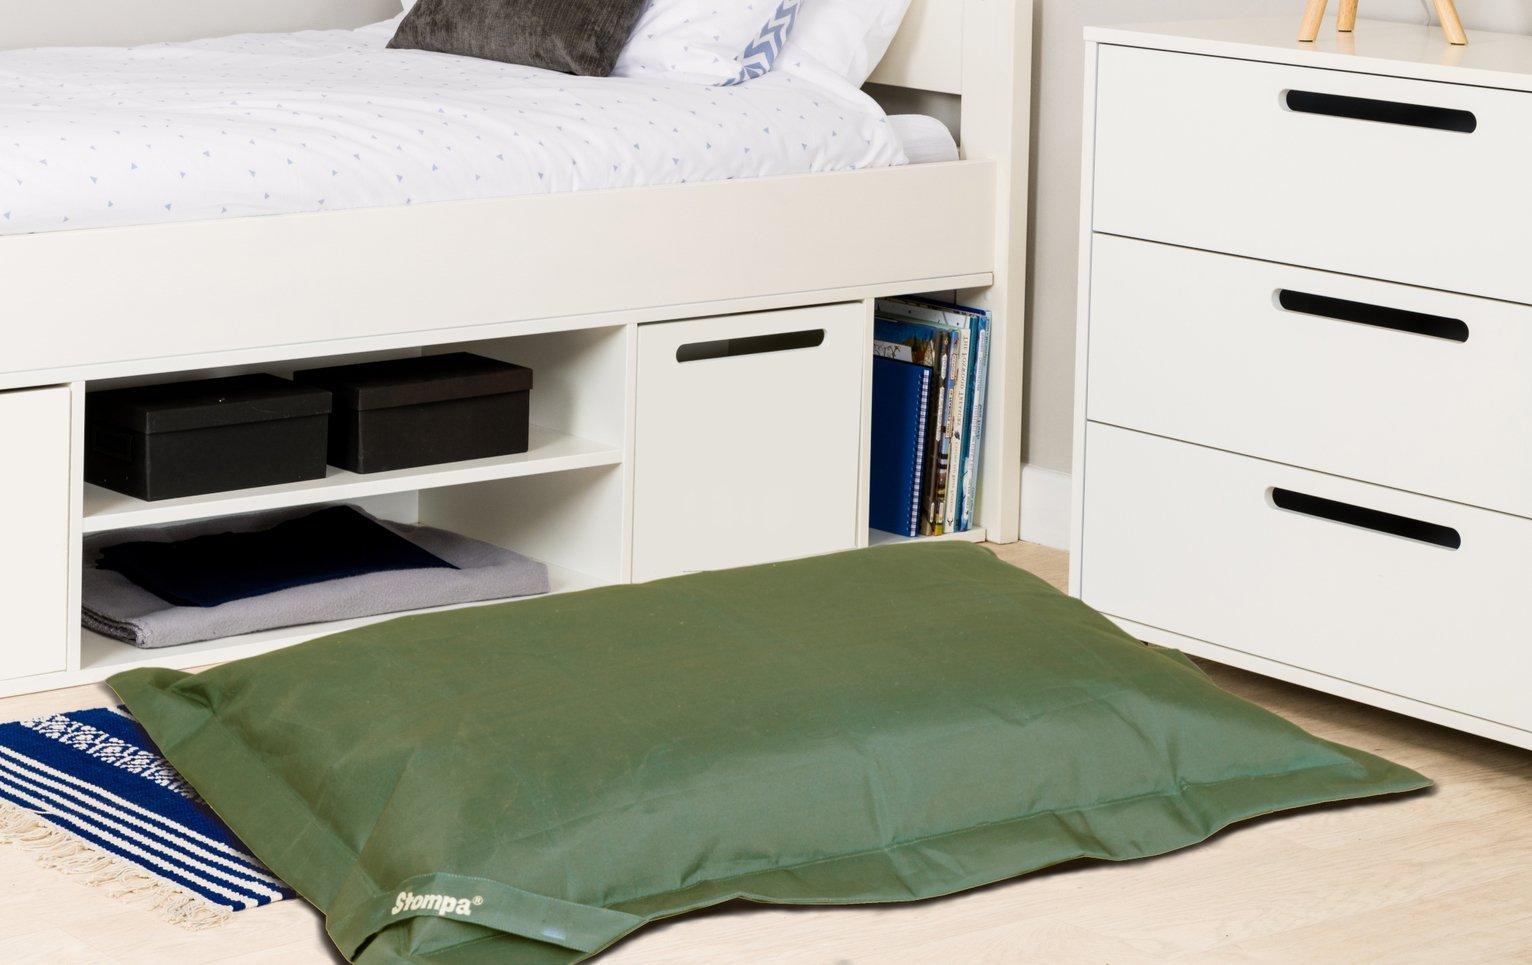 Stompa Extra Large Floor Beanbag - Khaki